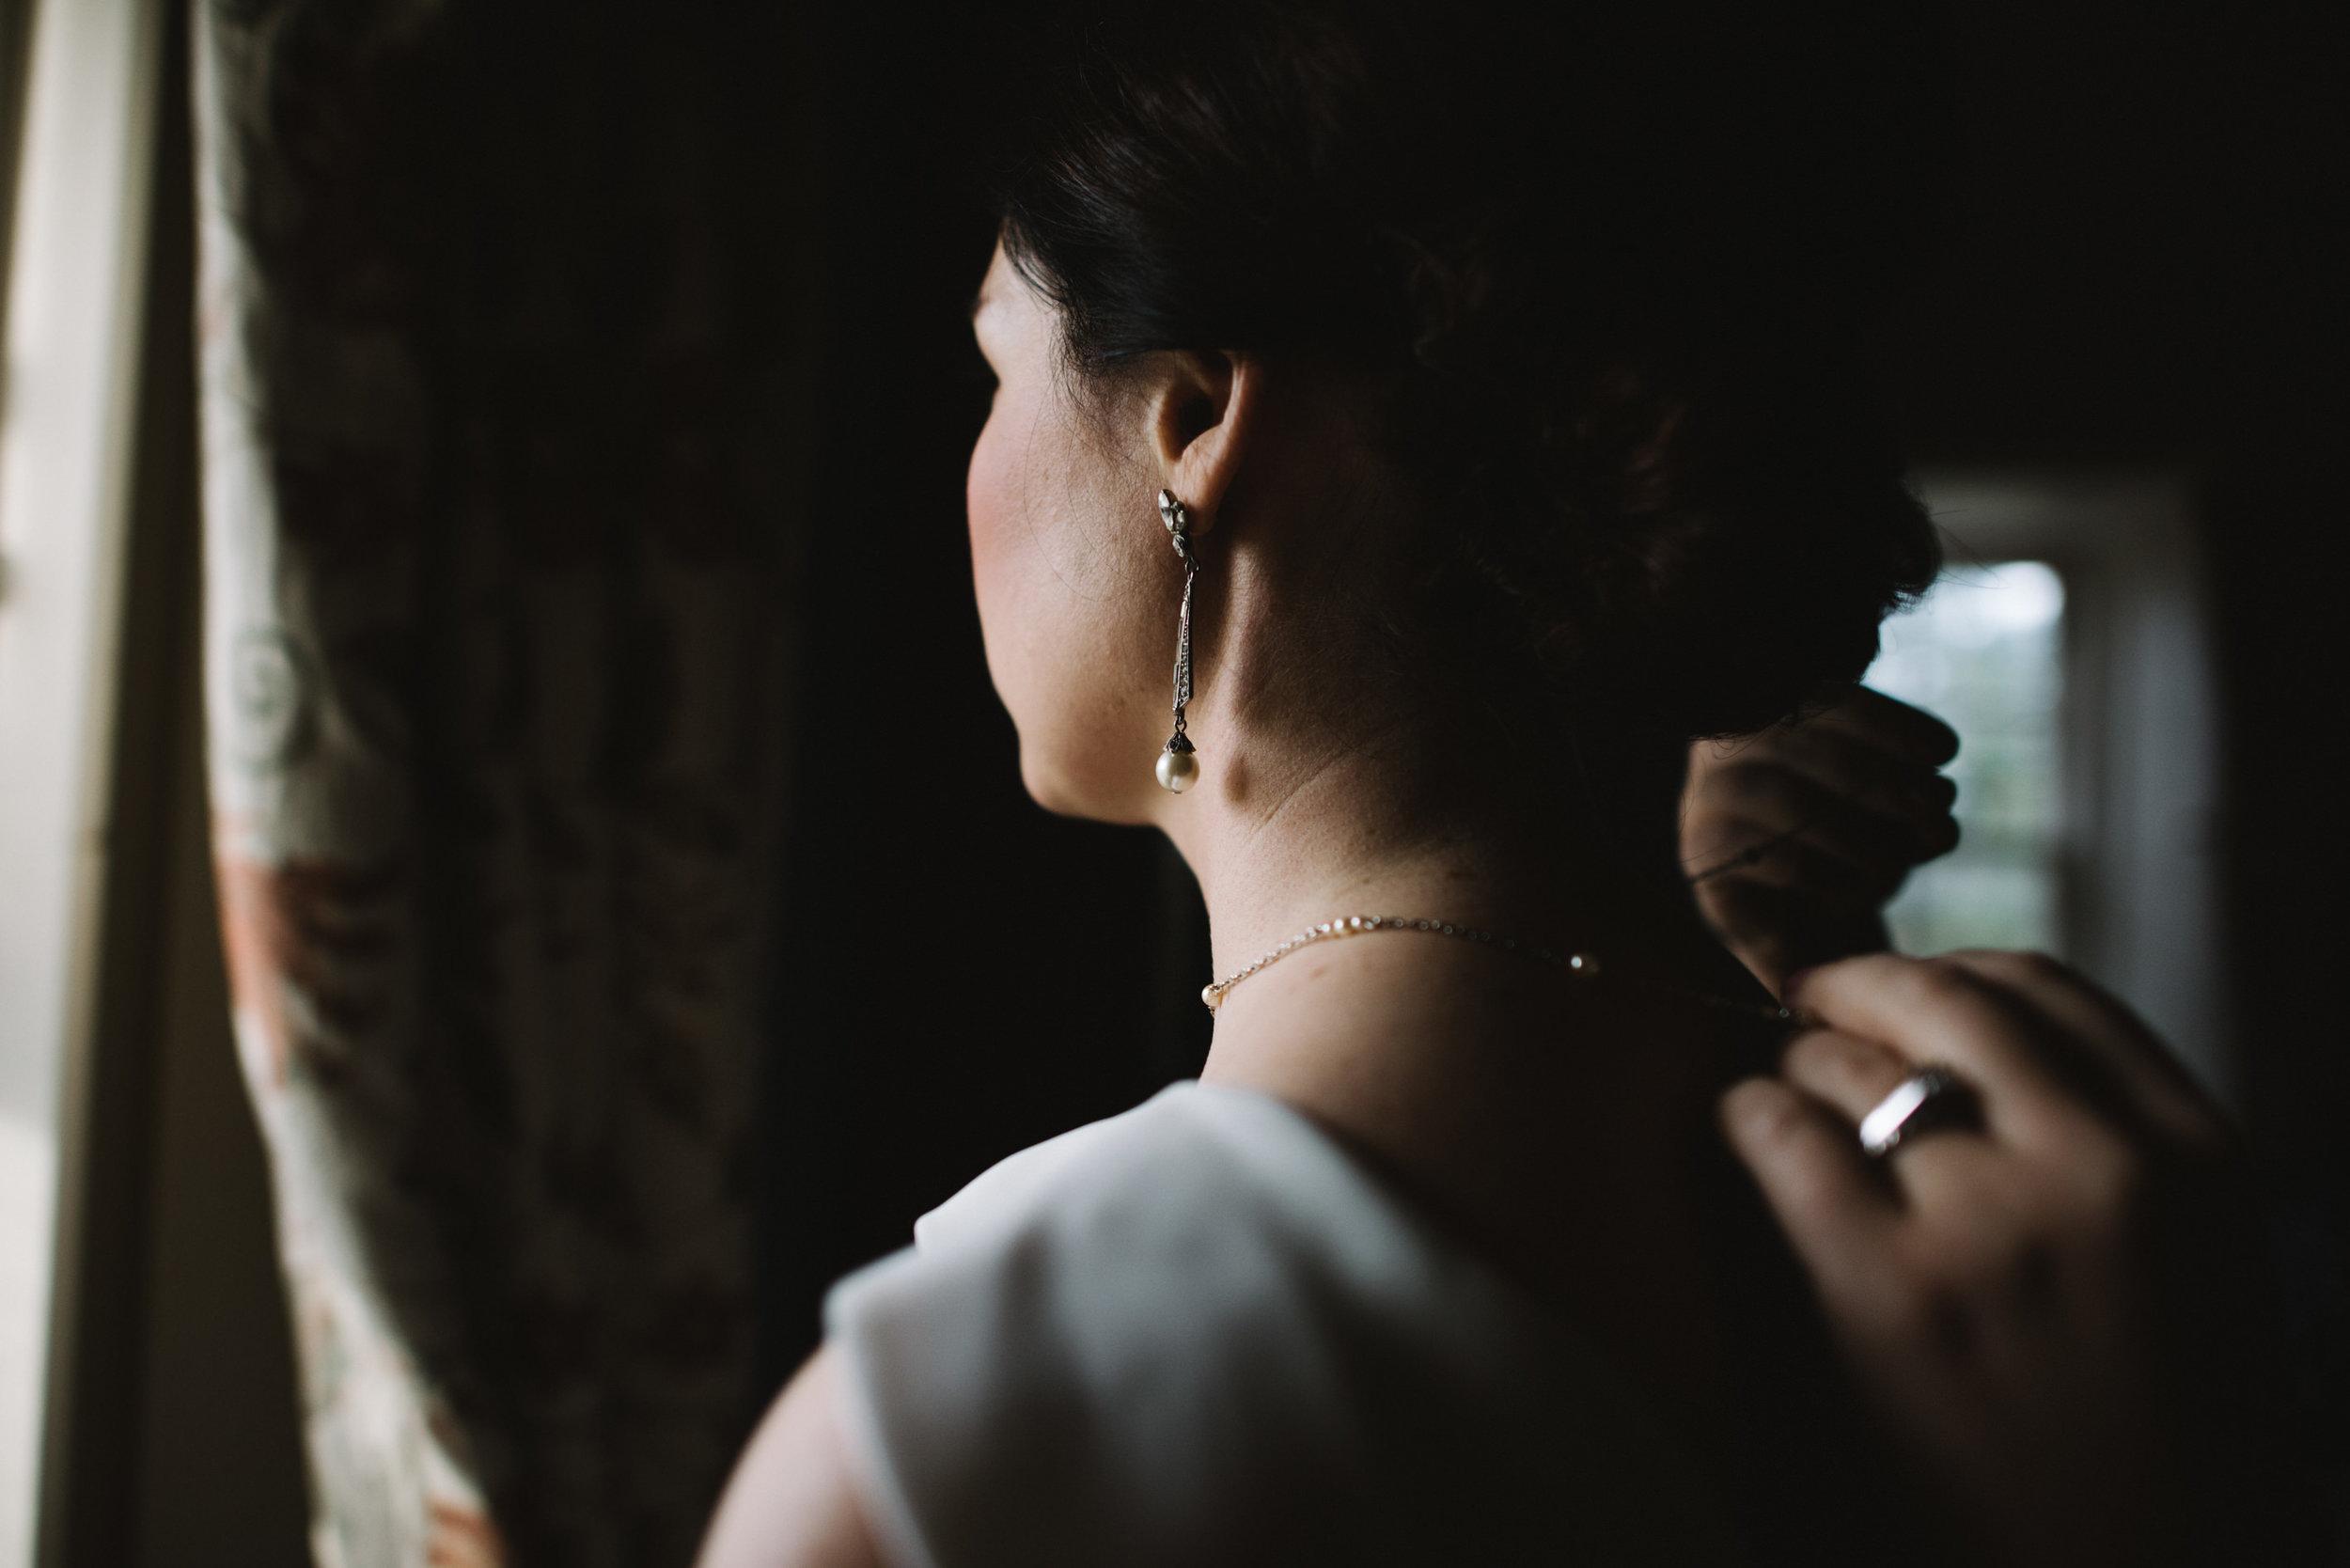 0004-LISA-DEVINE-PHOTOGRAPHY-ALTERNATIVE-WEDDING-PHOTOGRAPHY-SCOTLAND-DESTINATION-WEDDINGS-GLASGOW-WEDDINGS-COOL-WEDDINGS-STYLISH-WEDDINGS.JPG